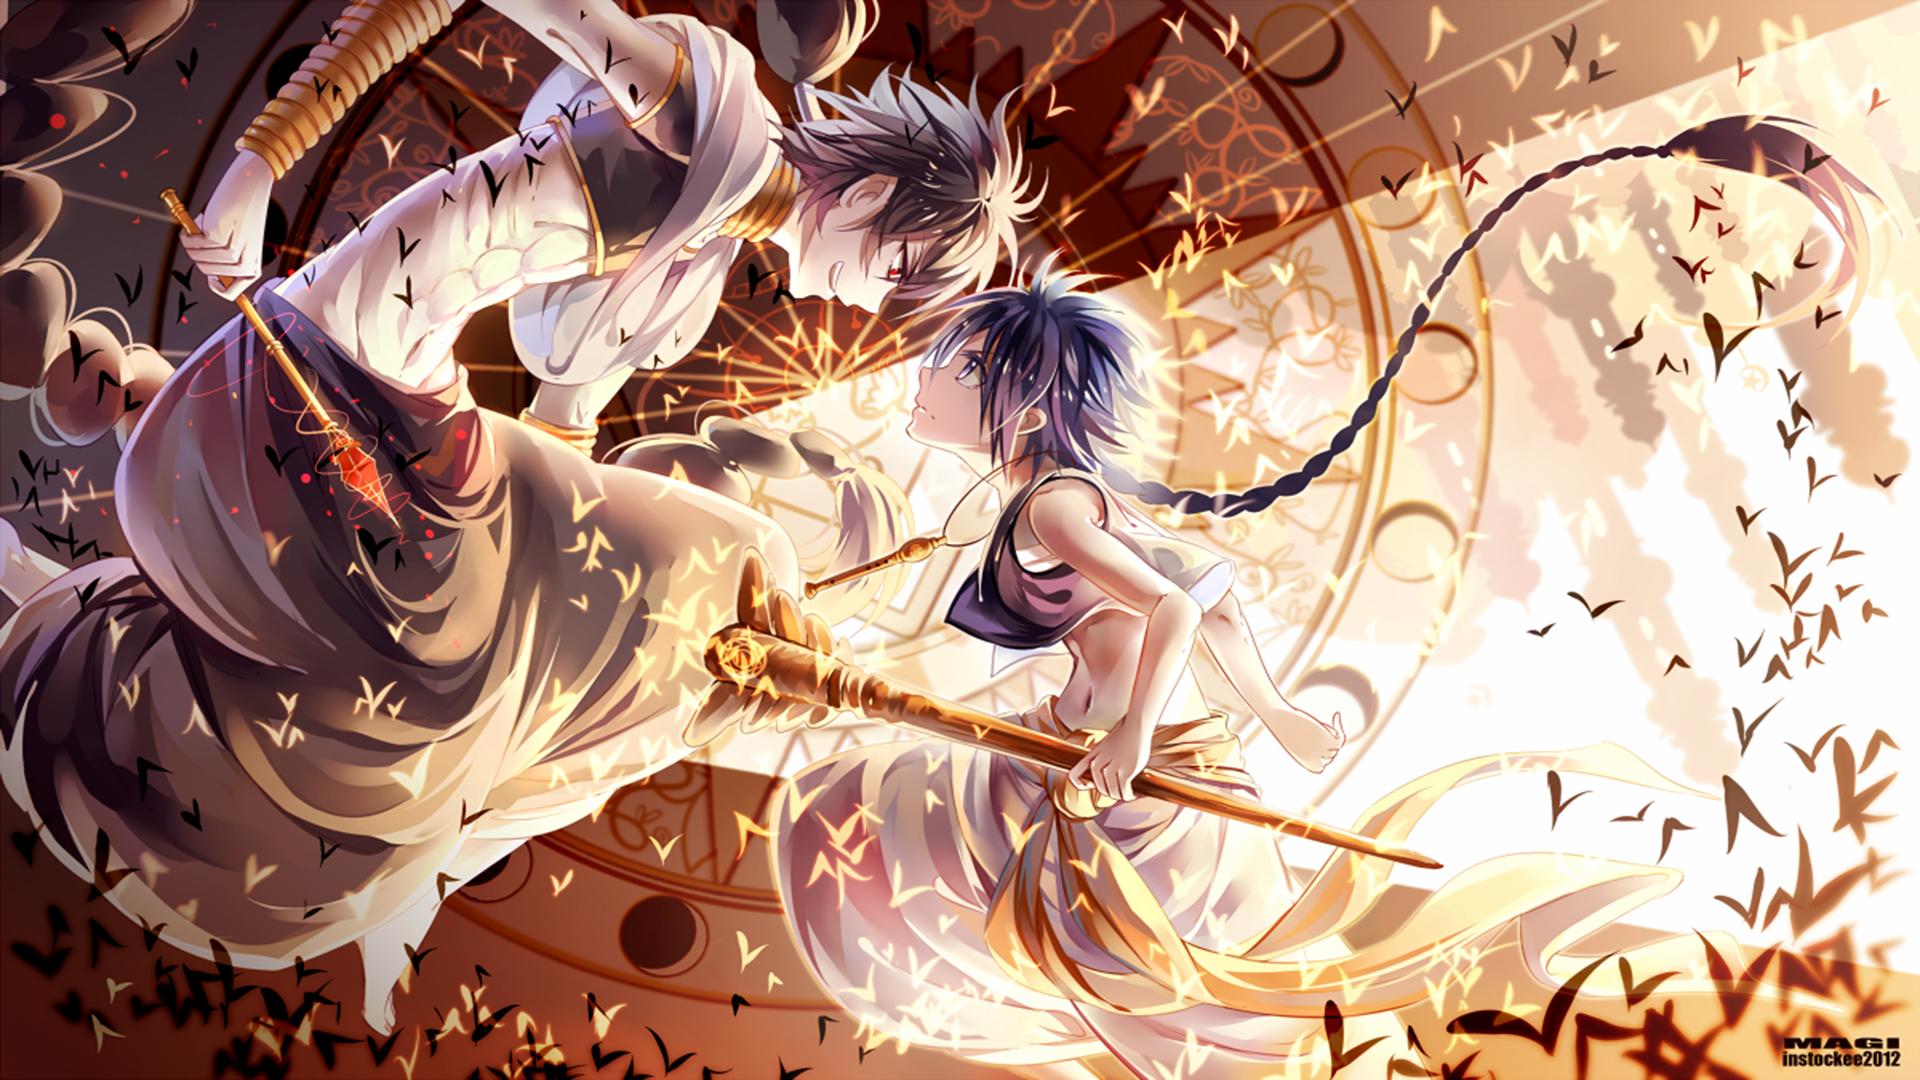 Magi wallpaper google search fantasy manga anime - Google anime wallpaper ...